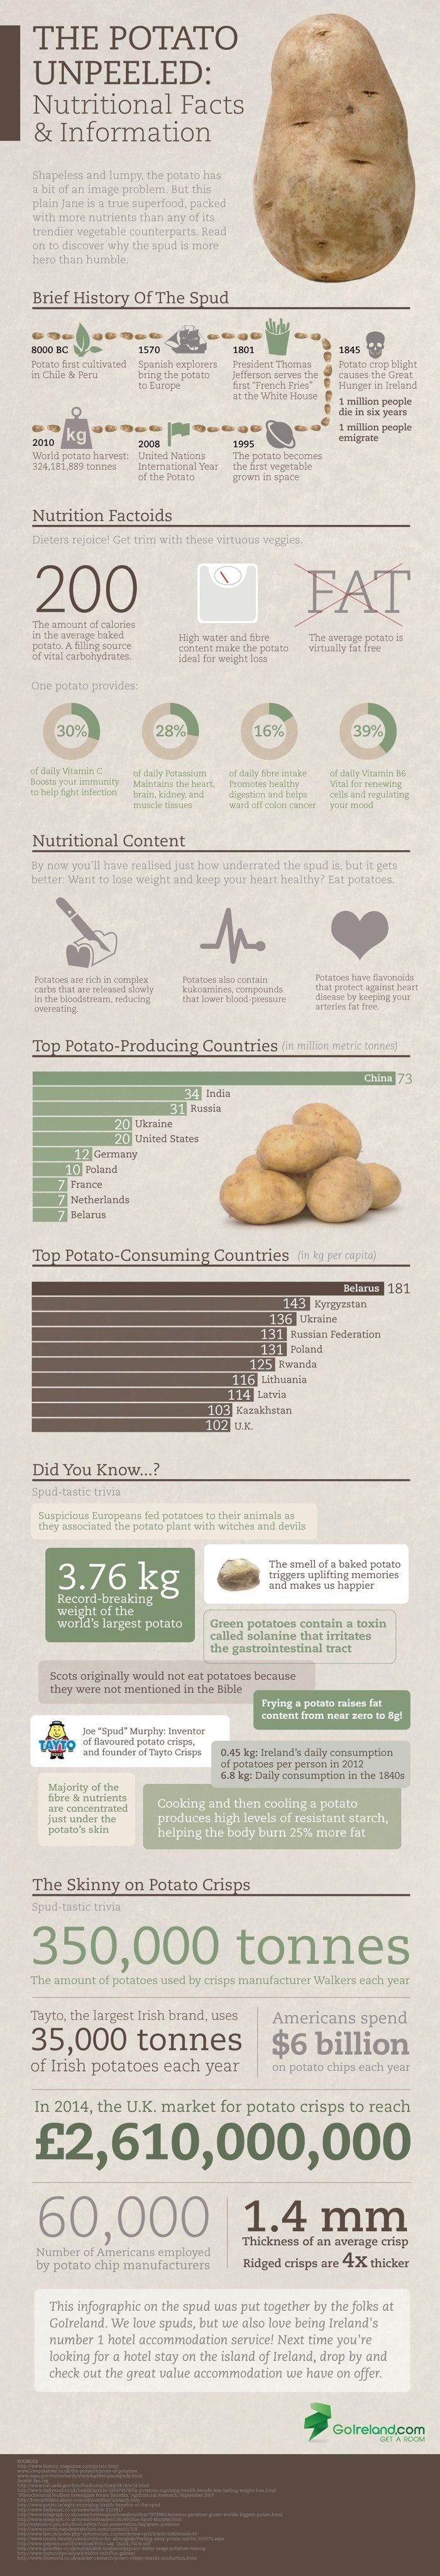 Potato Nutrition Data  The Potato Unpeeled Nutritional Facts & Information